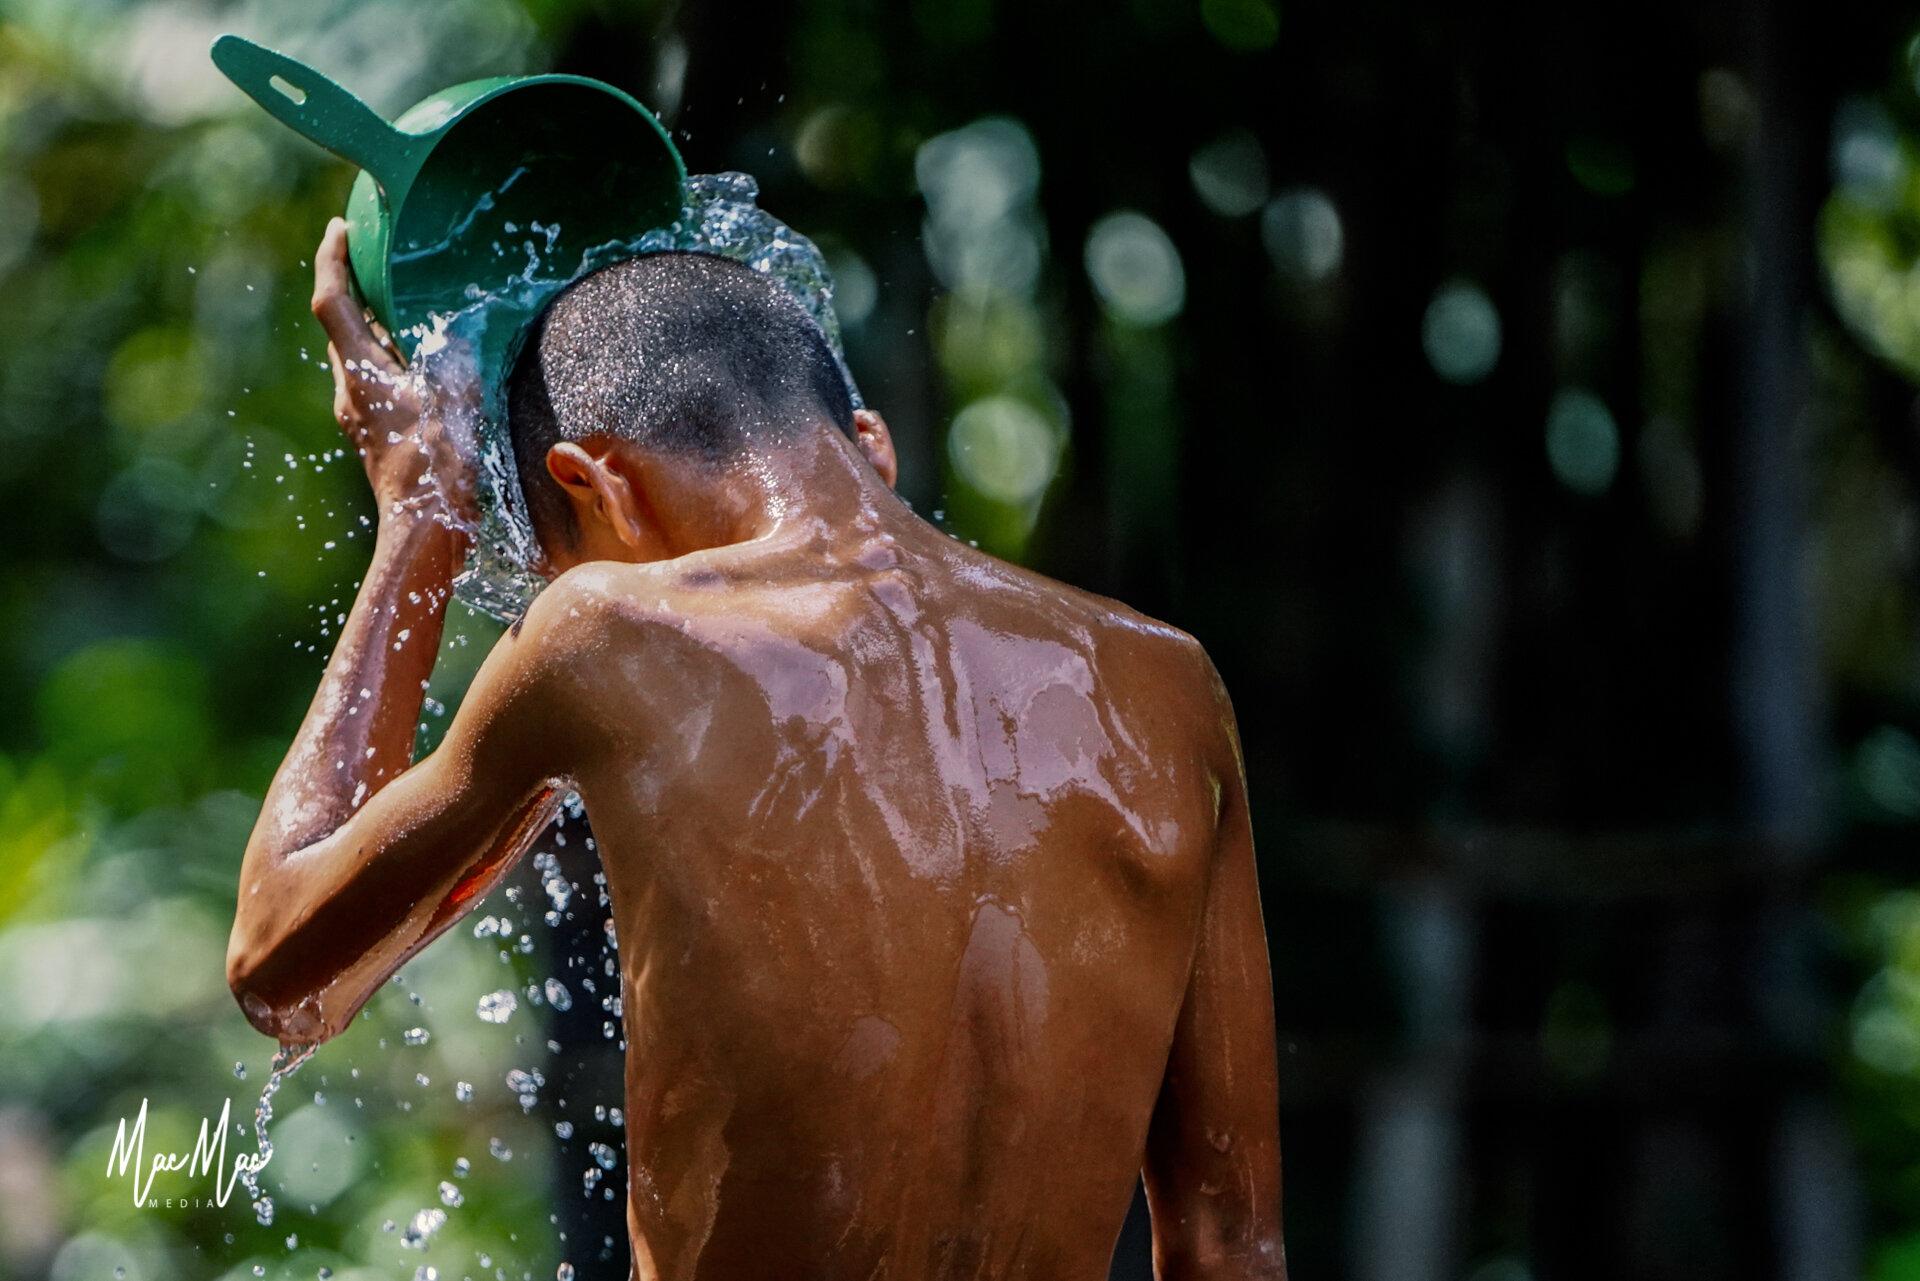 Cambodia 19 - Southern Area Hospice Trek - October 2019